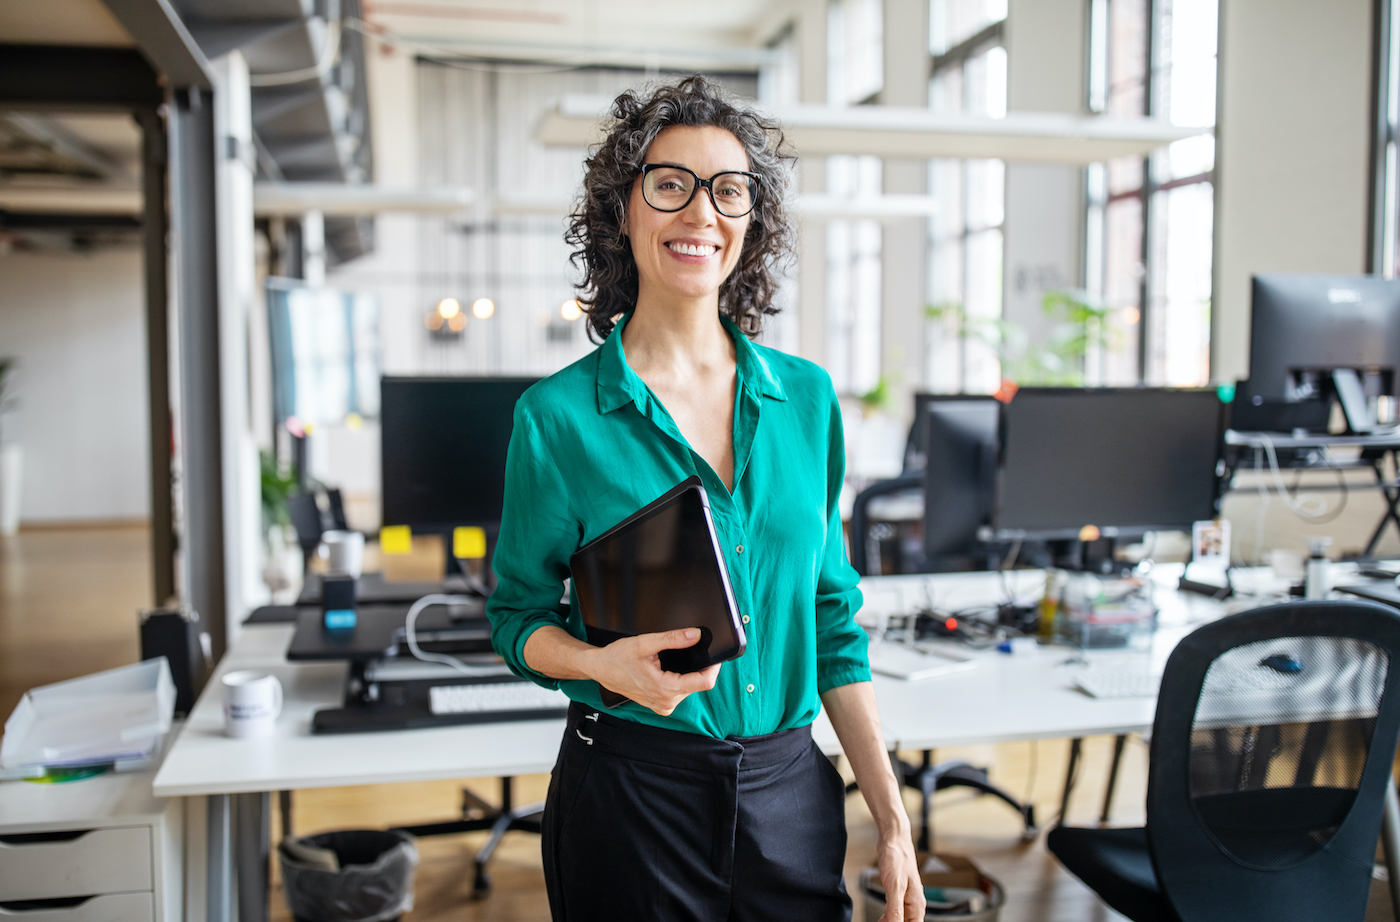 Portrait of mature businesswoman in casuals